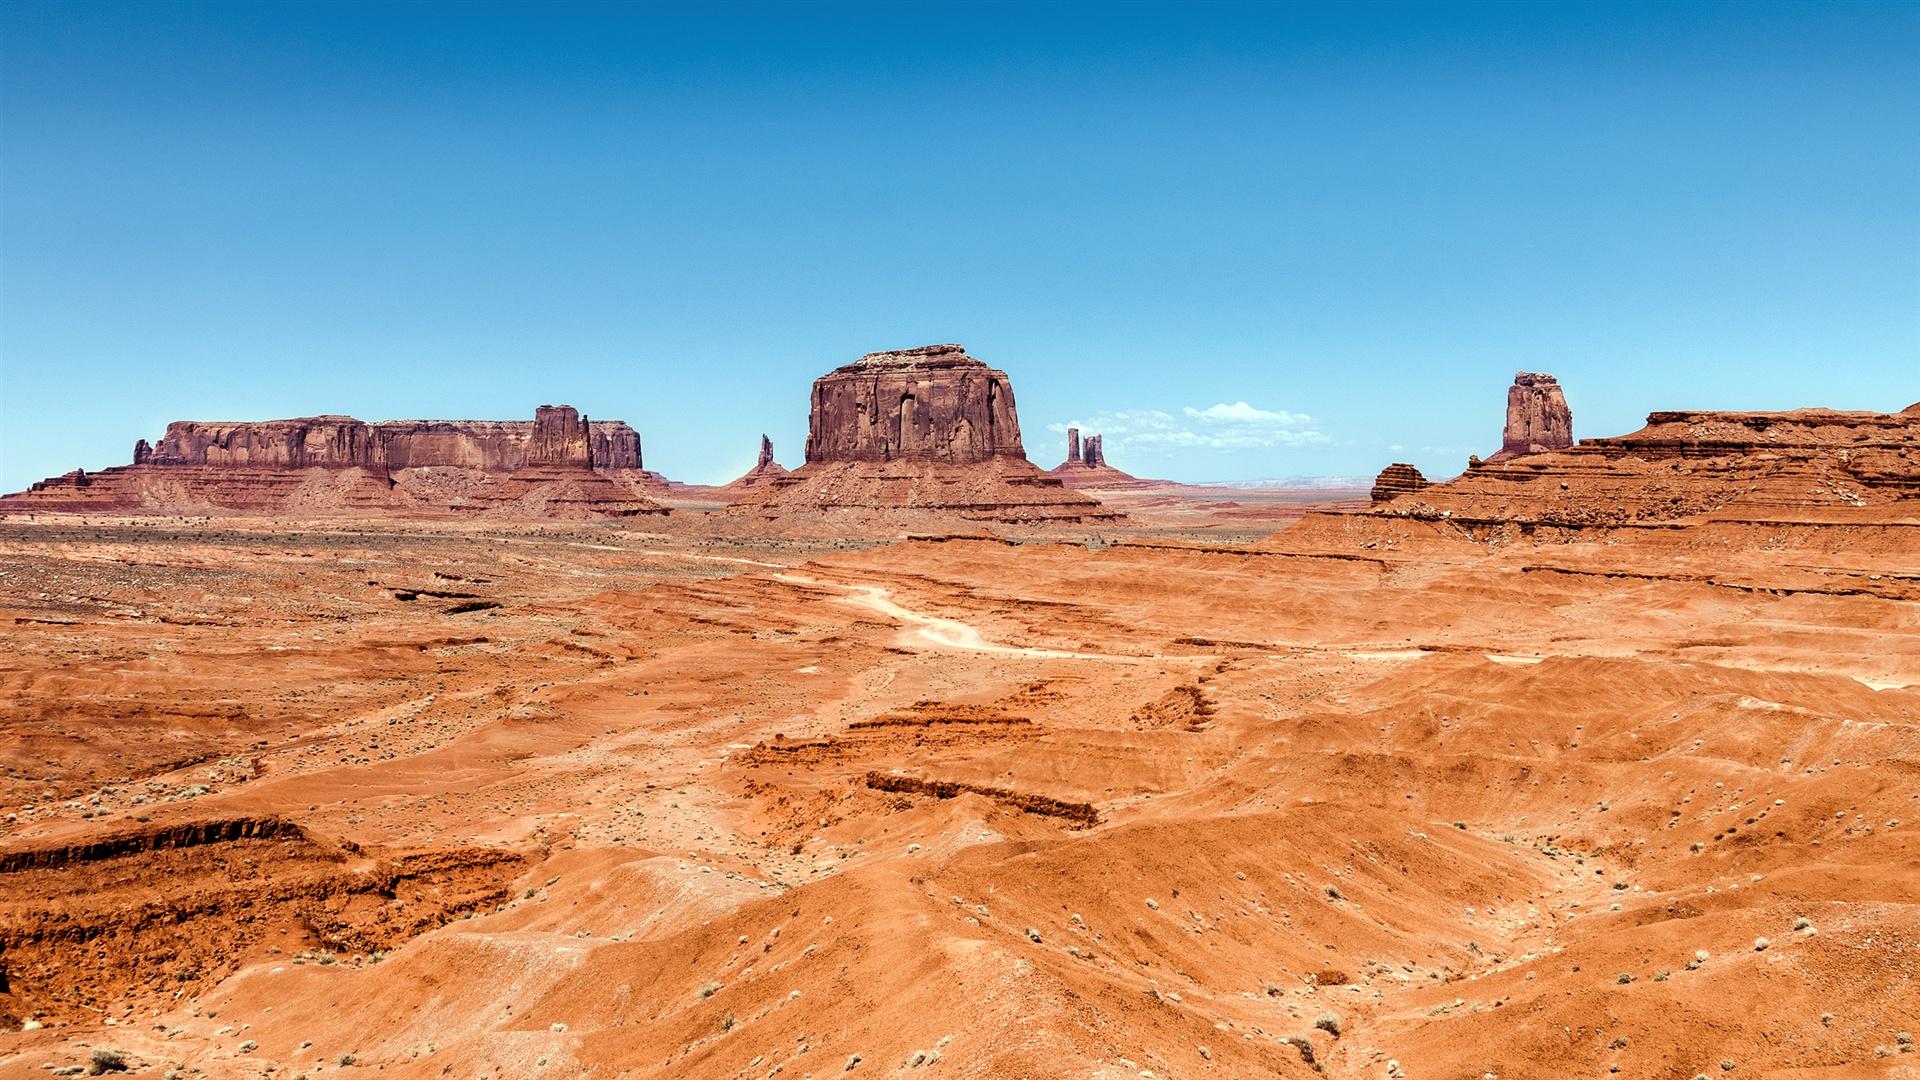 Valley desert rocks Utah Arizona USA Wallpaper Desktop Wallpapers 1920x1080